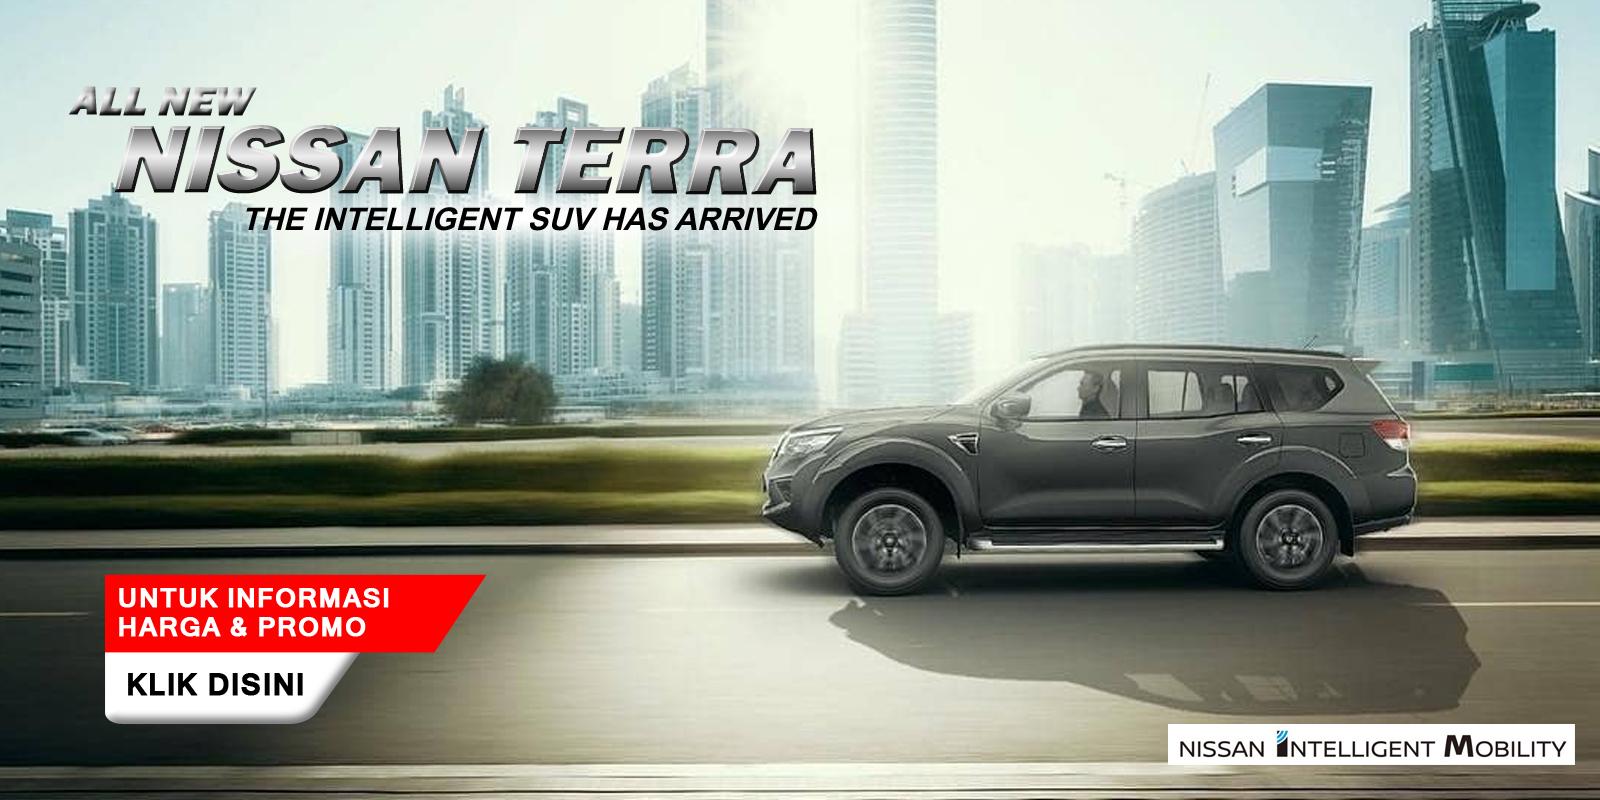 Nissan Terra - Indomobil Nissan